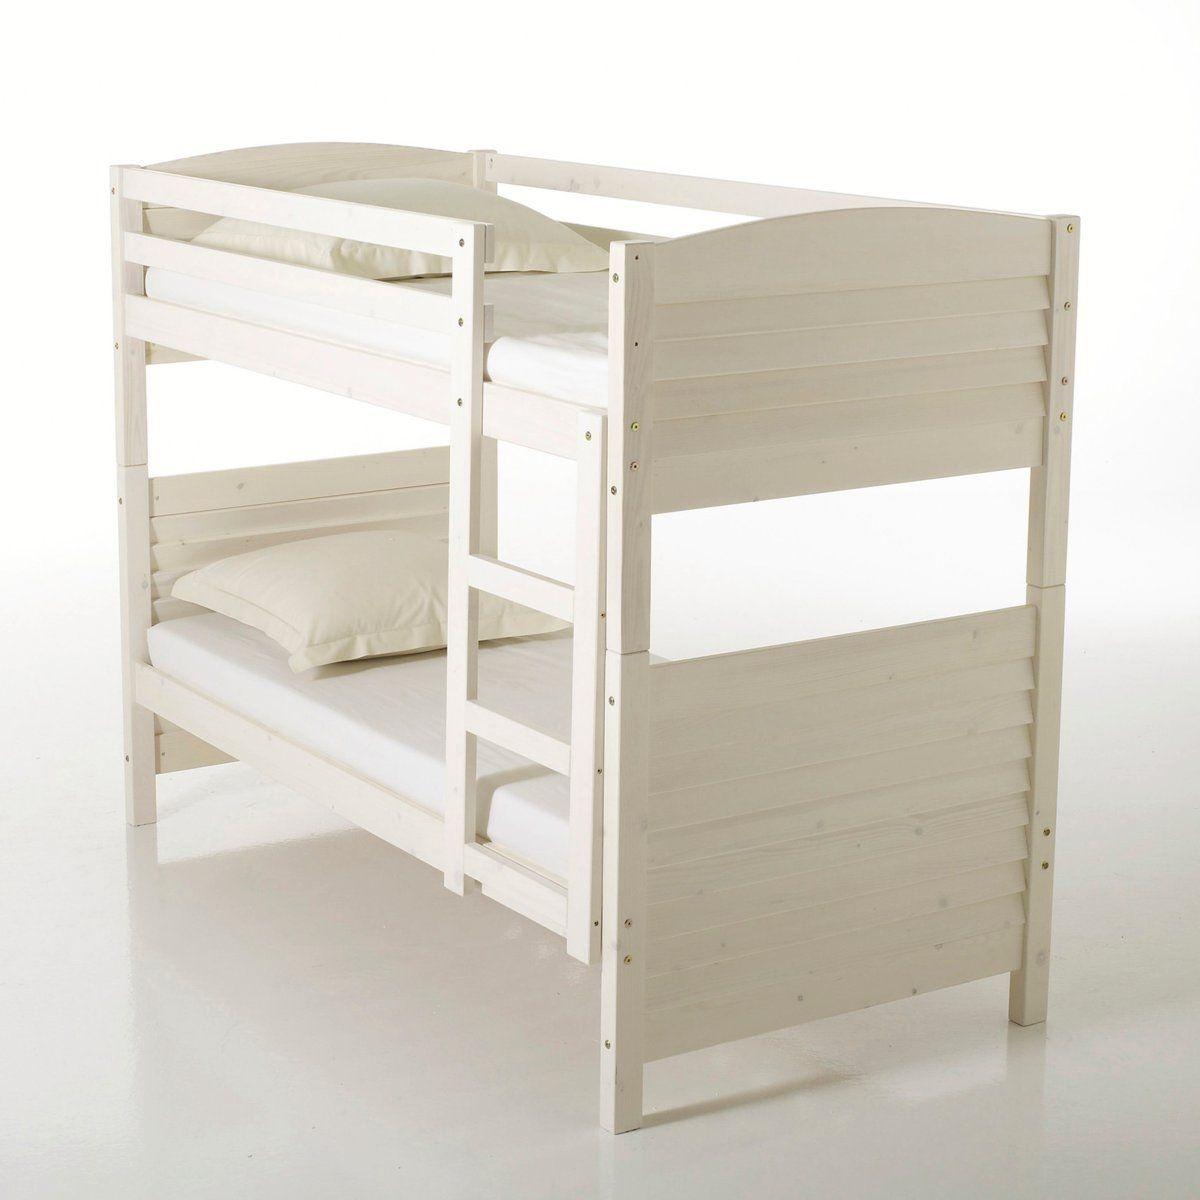 vente lits superposes tritoo maison et jardin. Black Bedroom Furniture Sets. Home Design Ideas